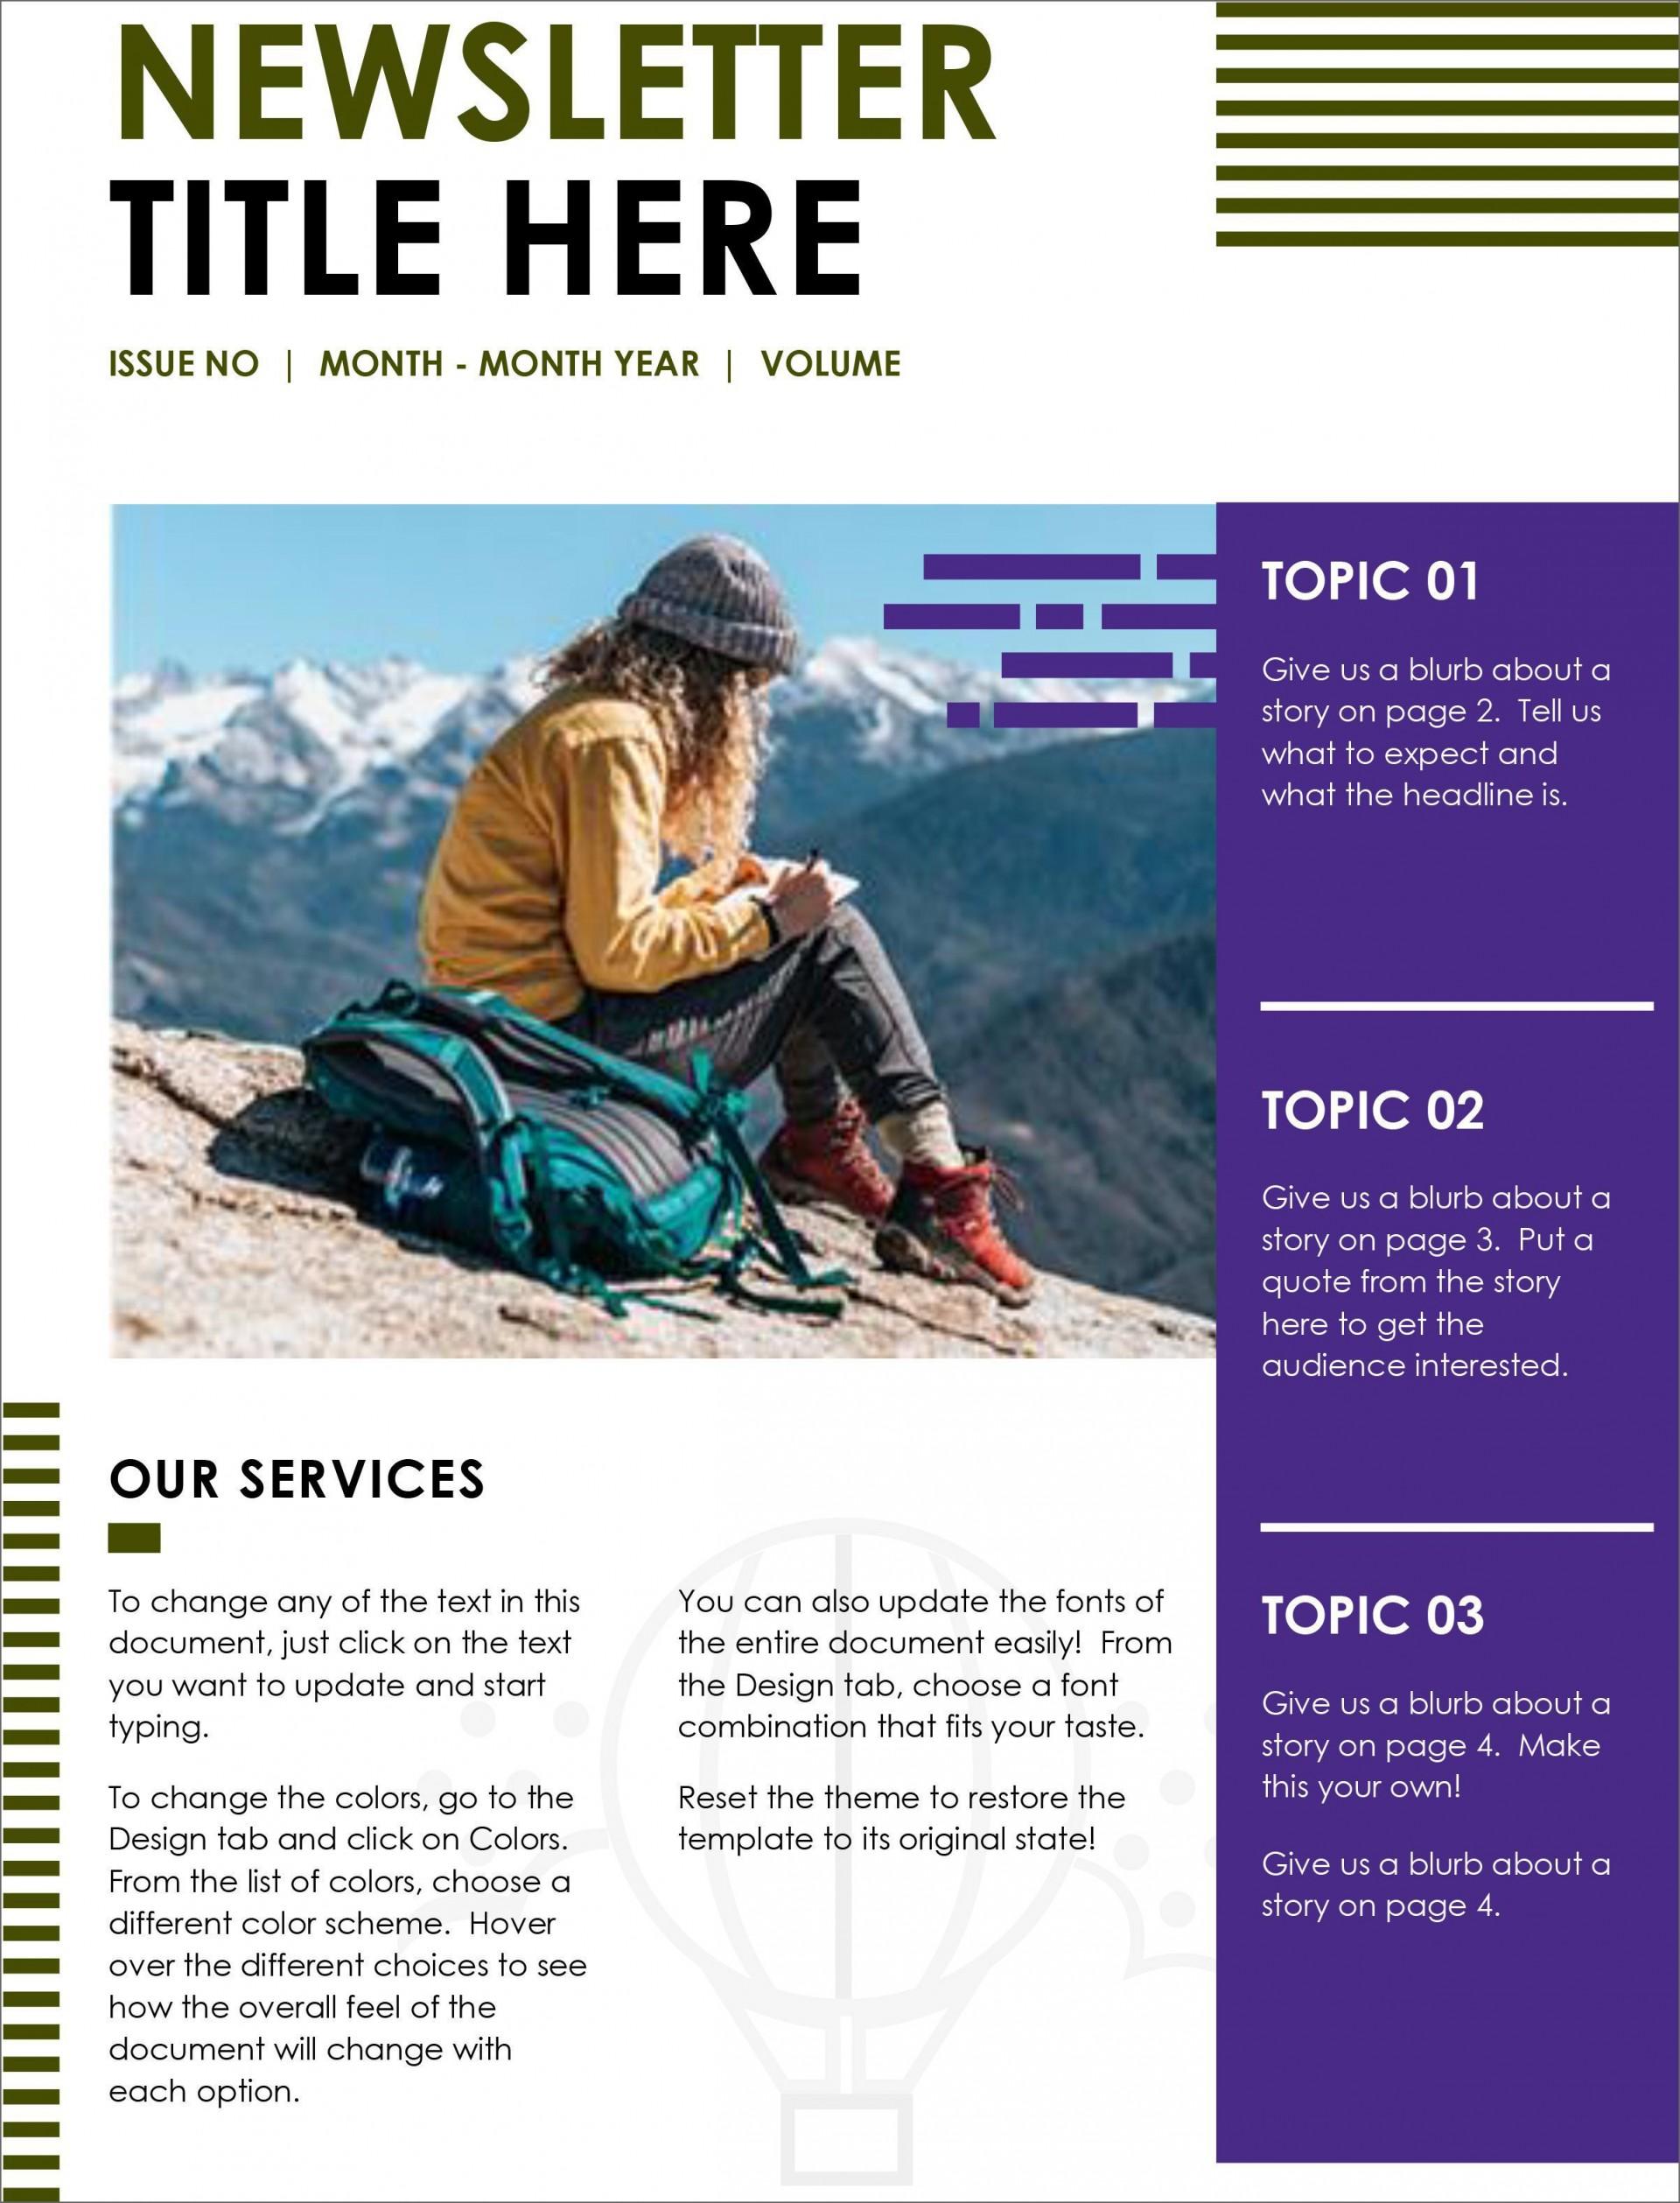 004 Singular Word Newsletter Template Free Download Highest Quality  Document M 2007 Design1920